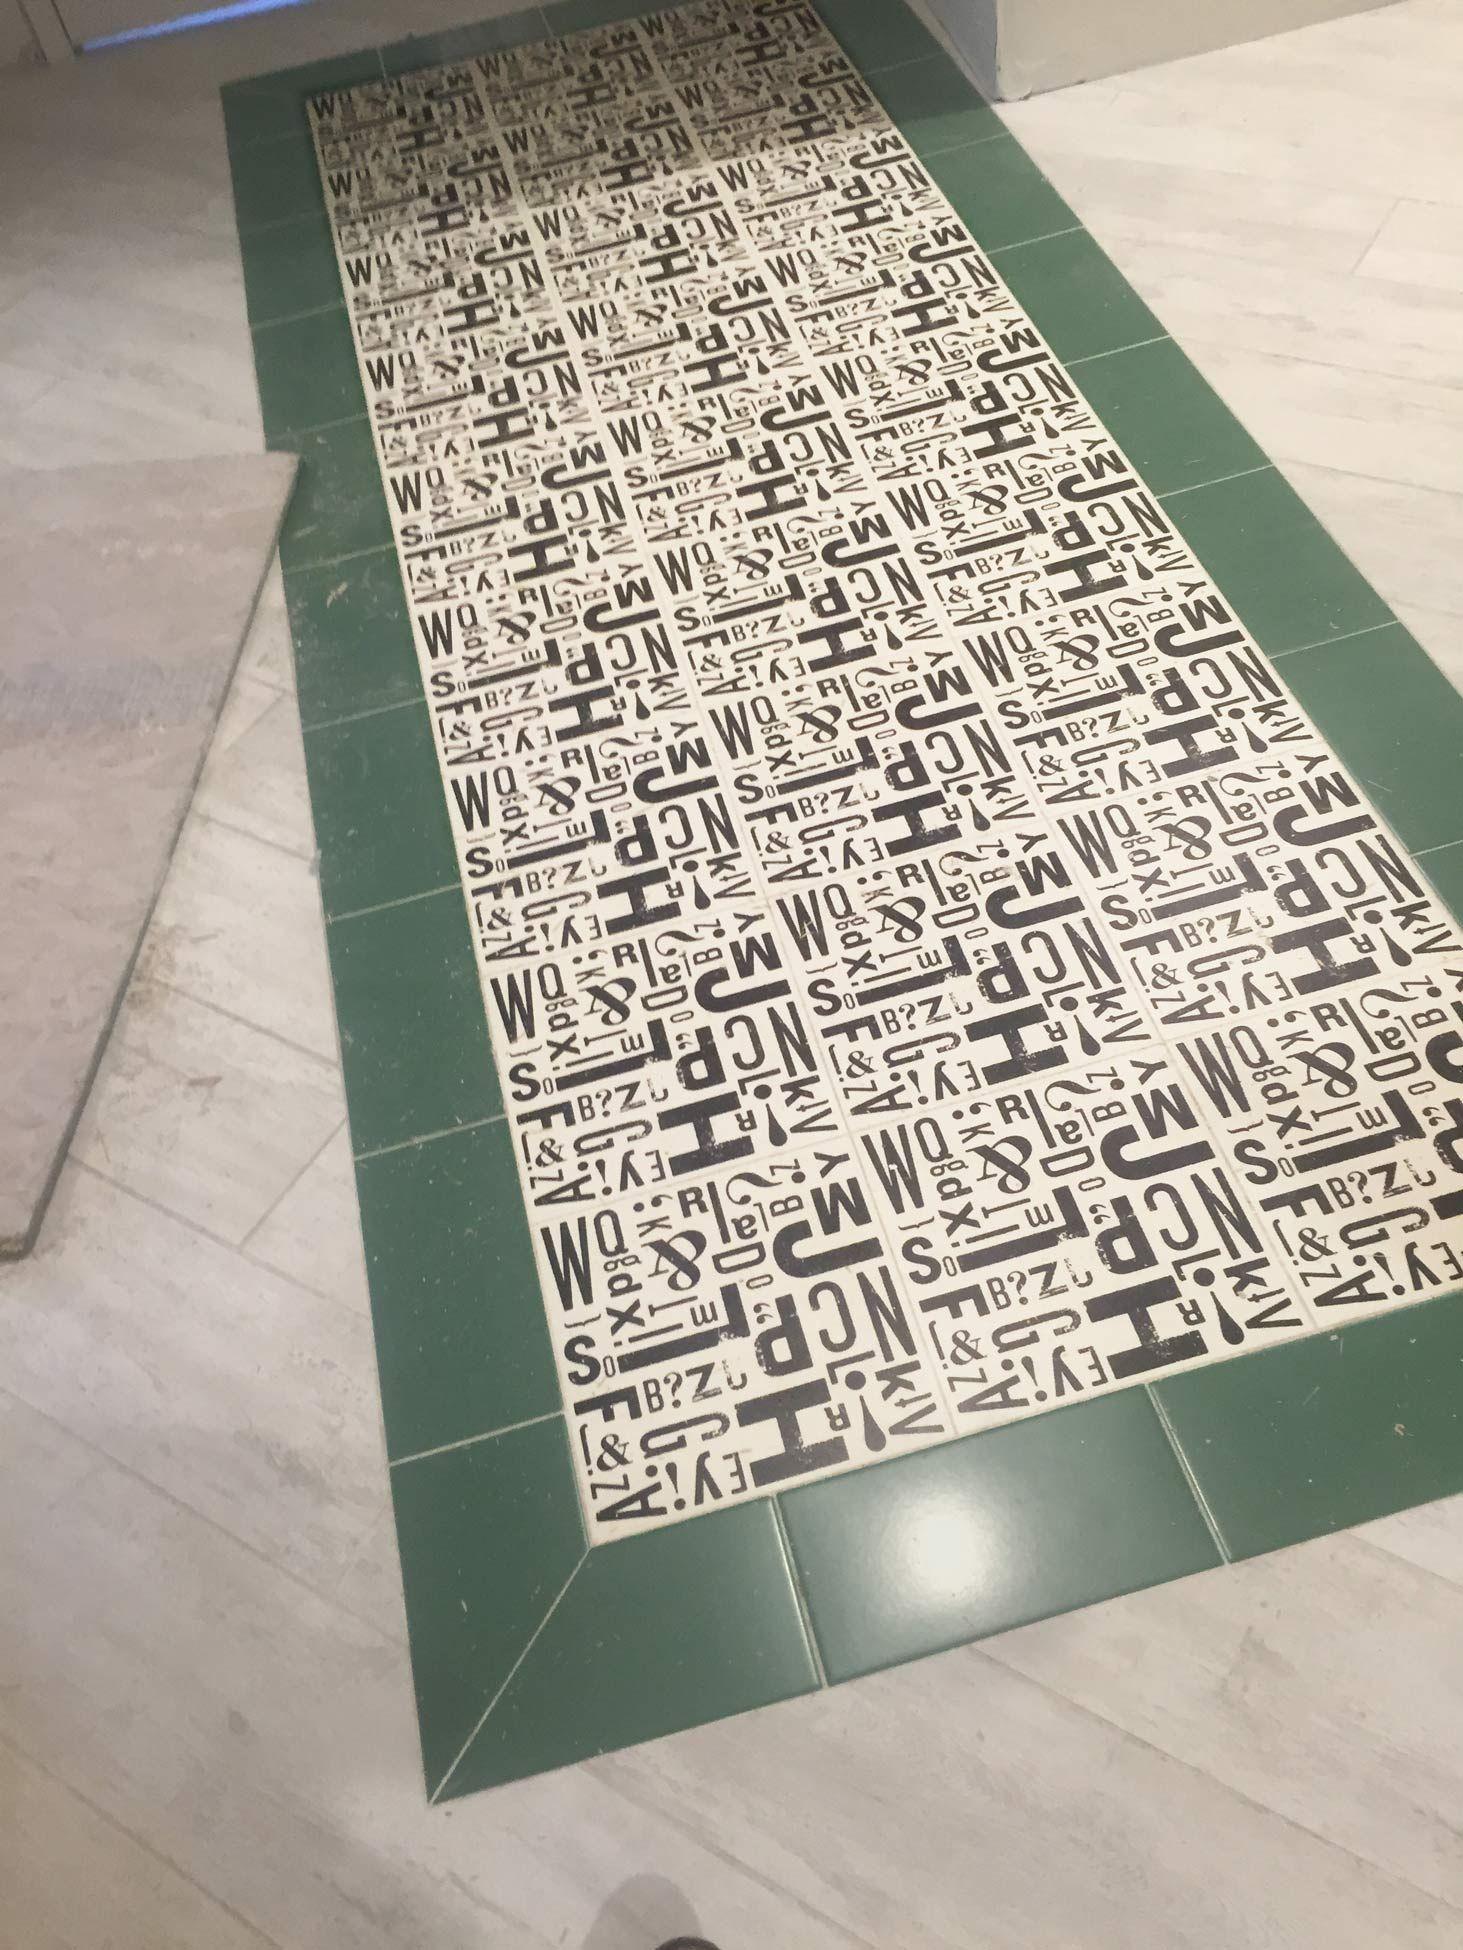 Custom floor tile medallion image for porcelain floor tile custom floor tile medallion image for porcelain floor tile supplied by interior decorating firm dailygadgetfo Choice Image